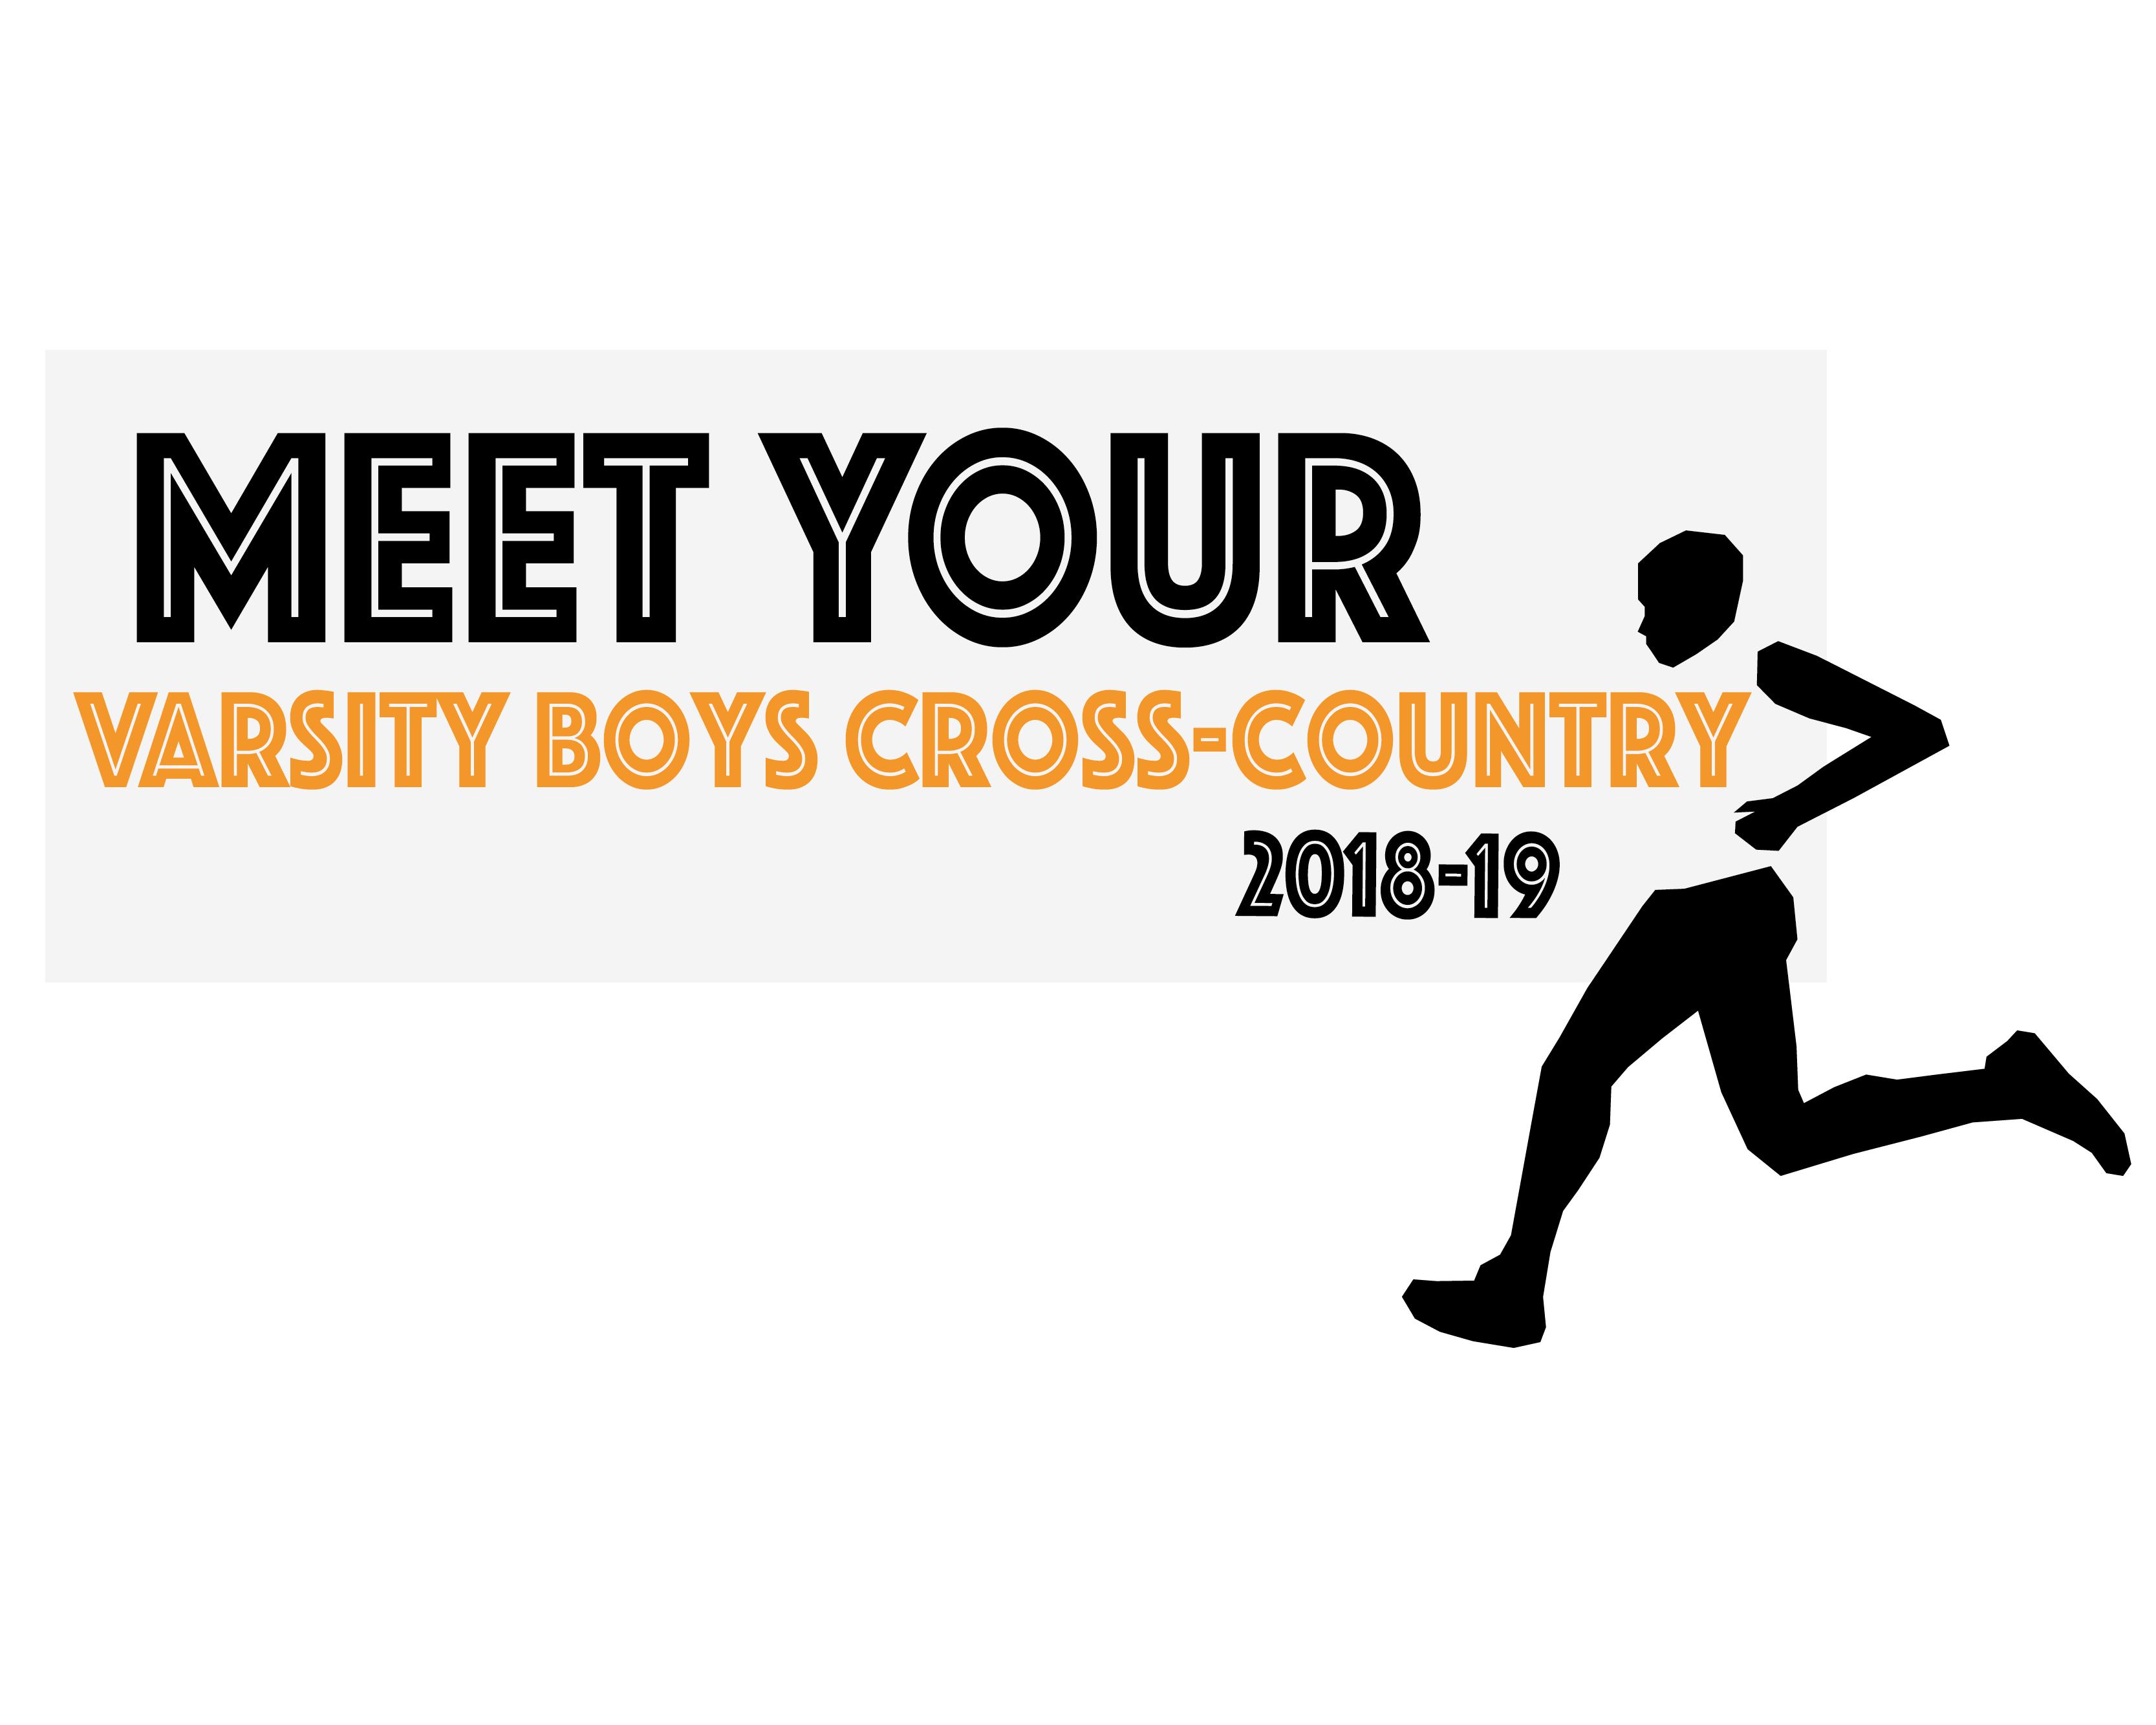 Meet Your Varsity Boys Cross Country Team 18-19